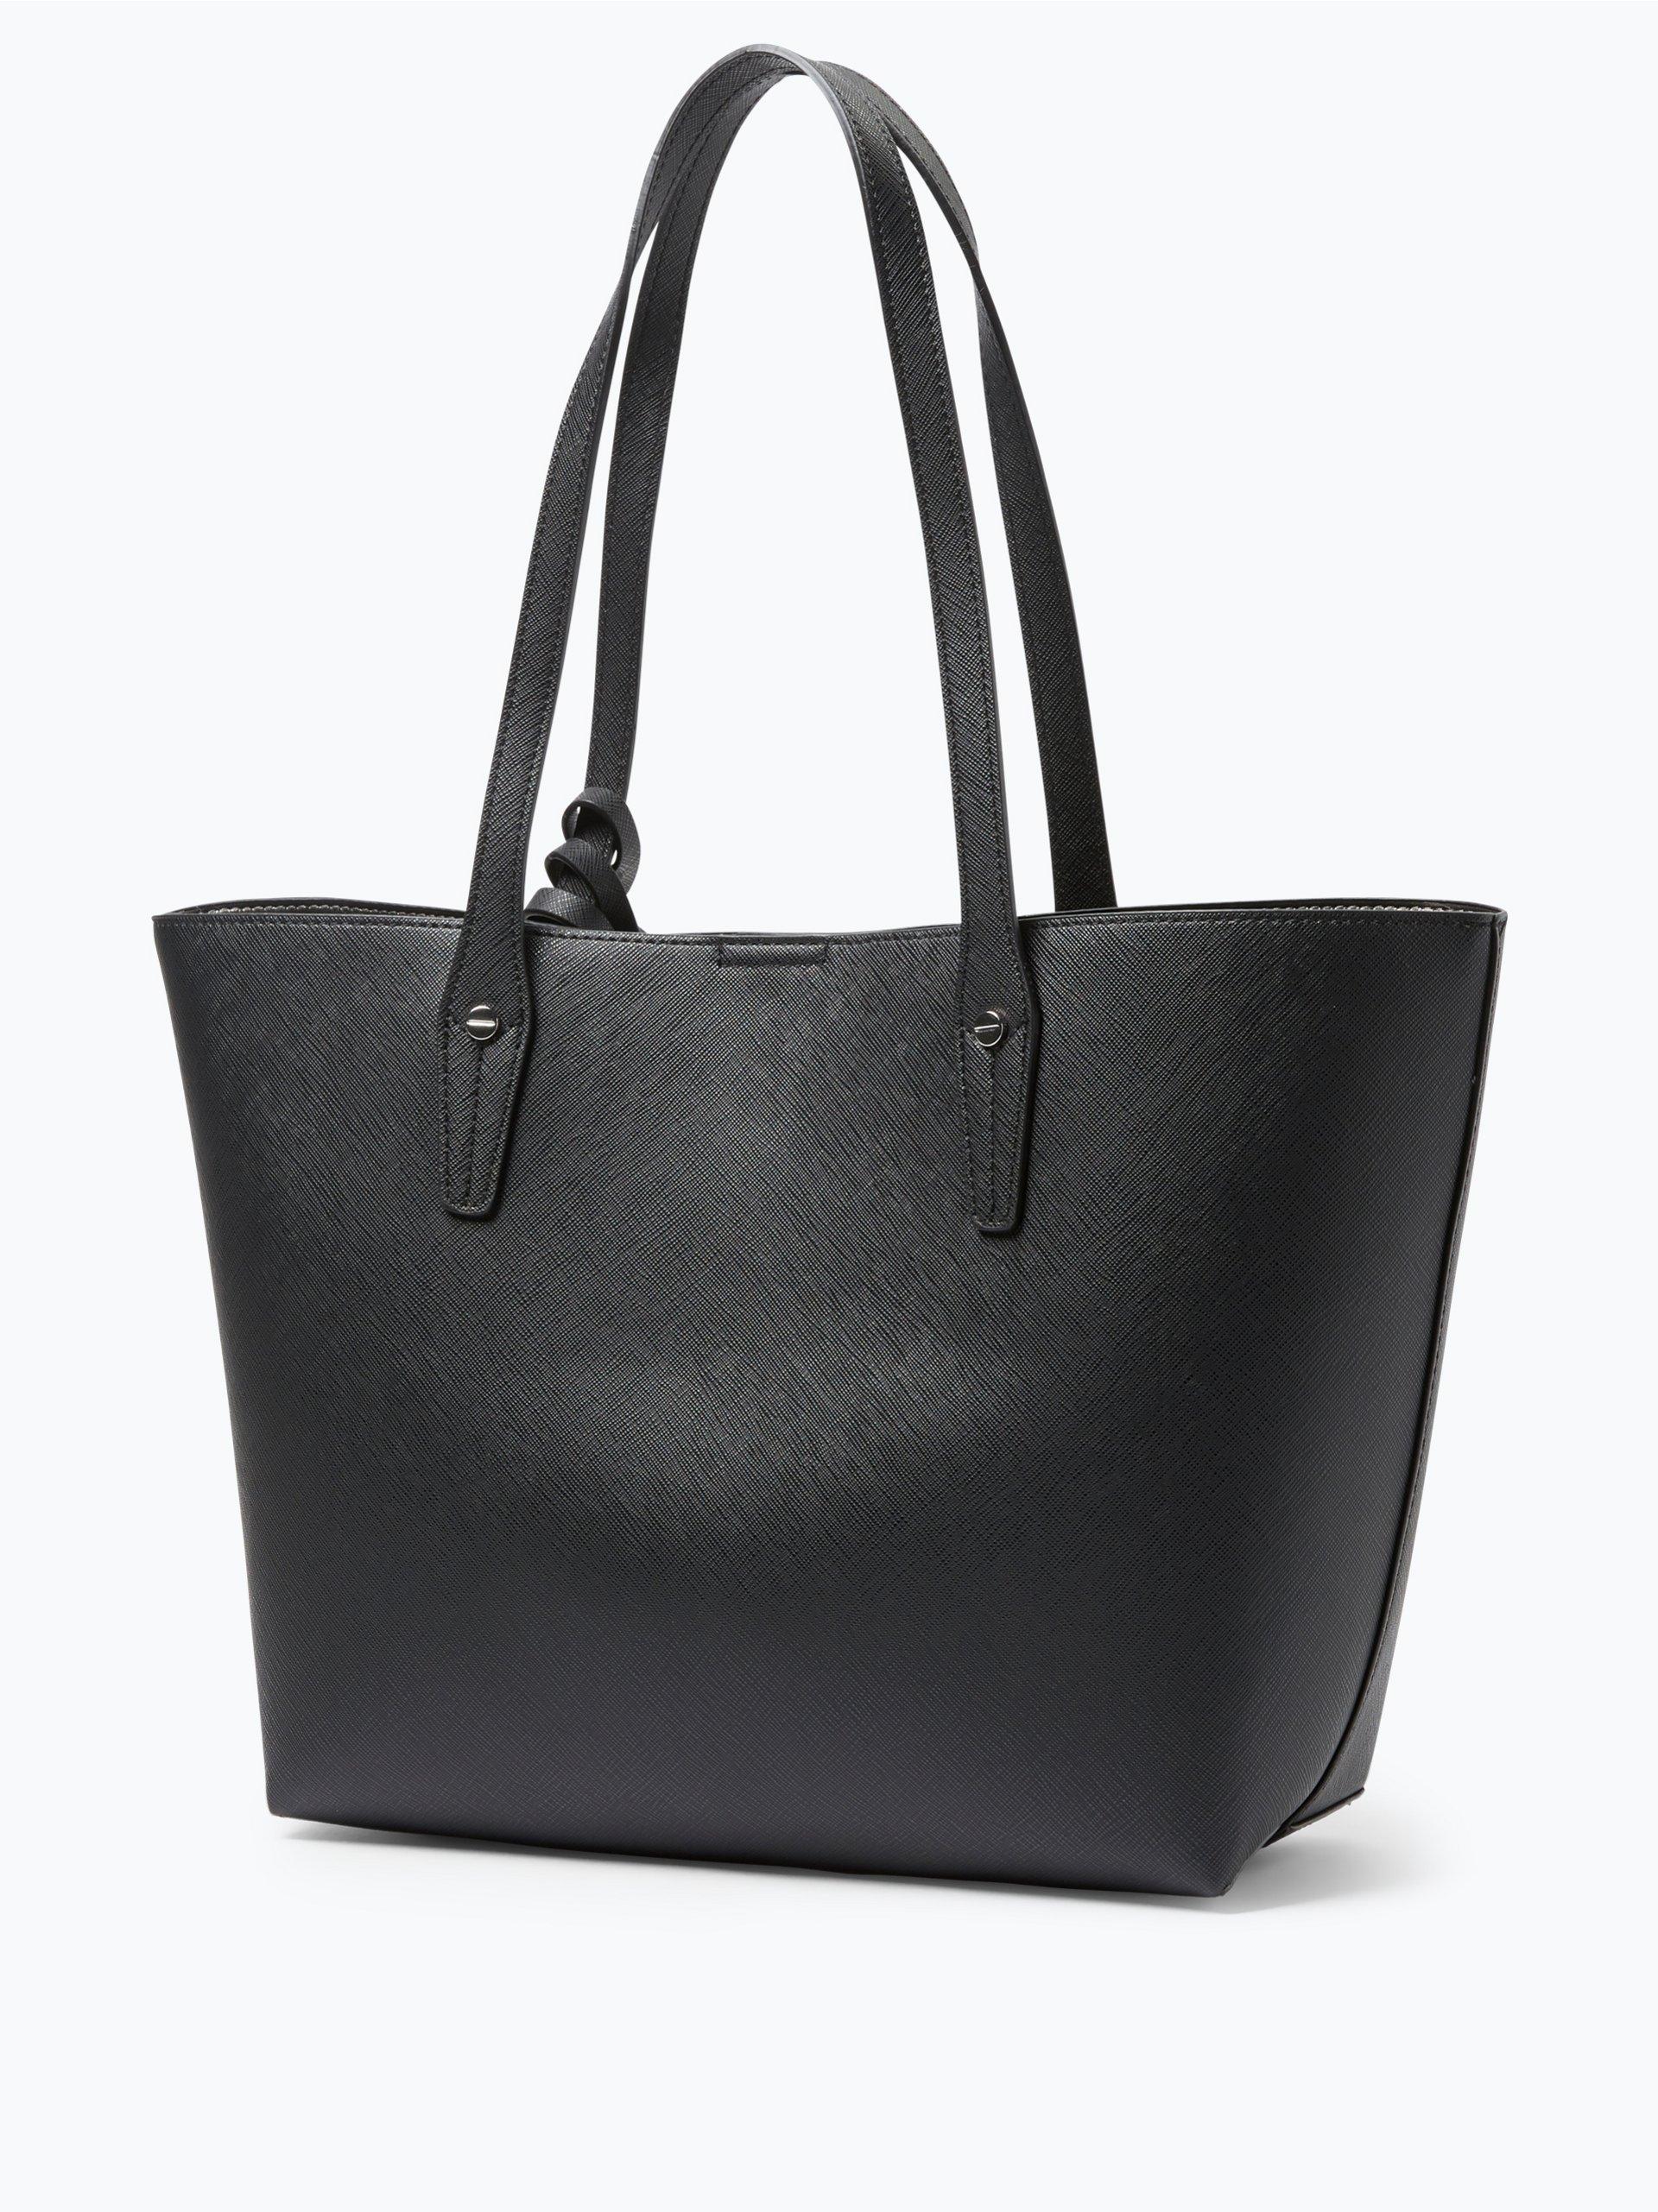 l credi damen shopper mit handtasche palma schwarz uni. Black Bedroom Furniture Sets. Home Design Ideas